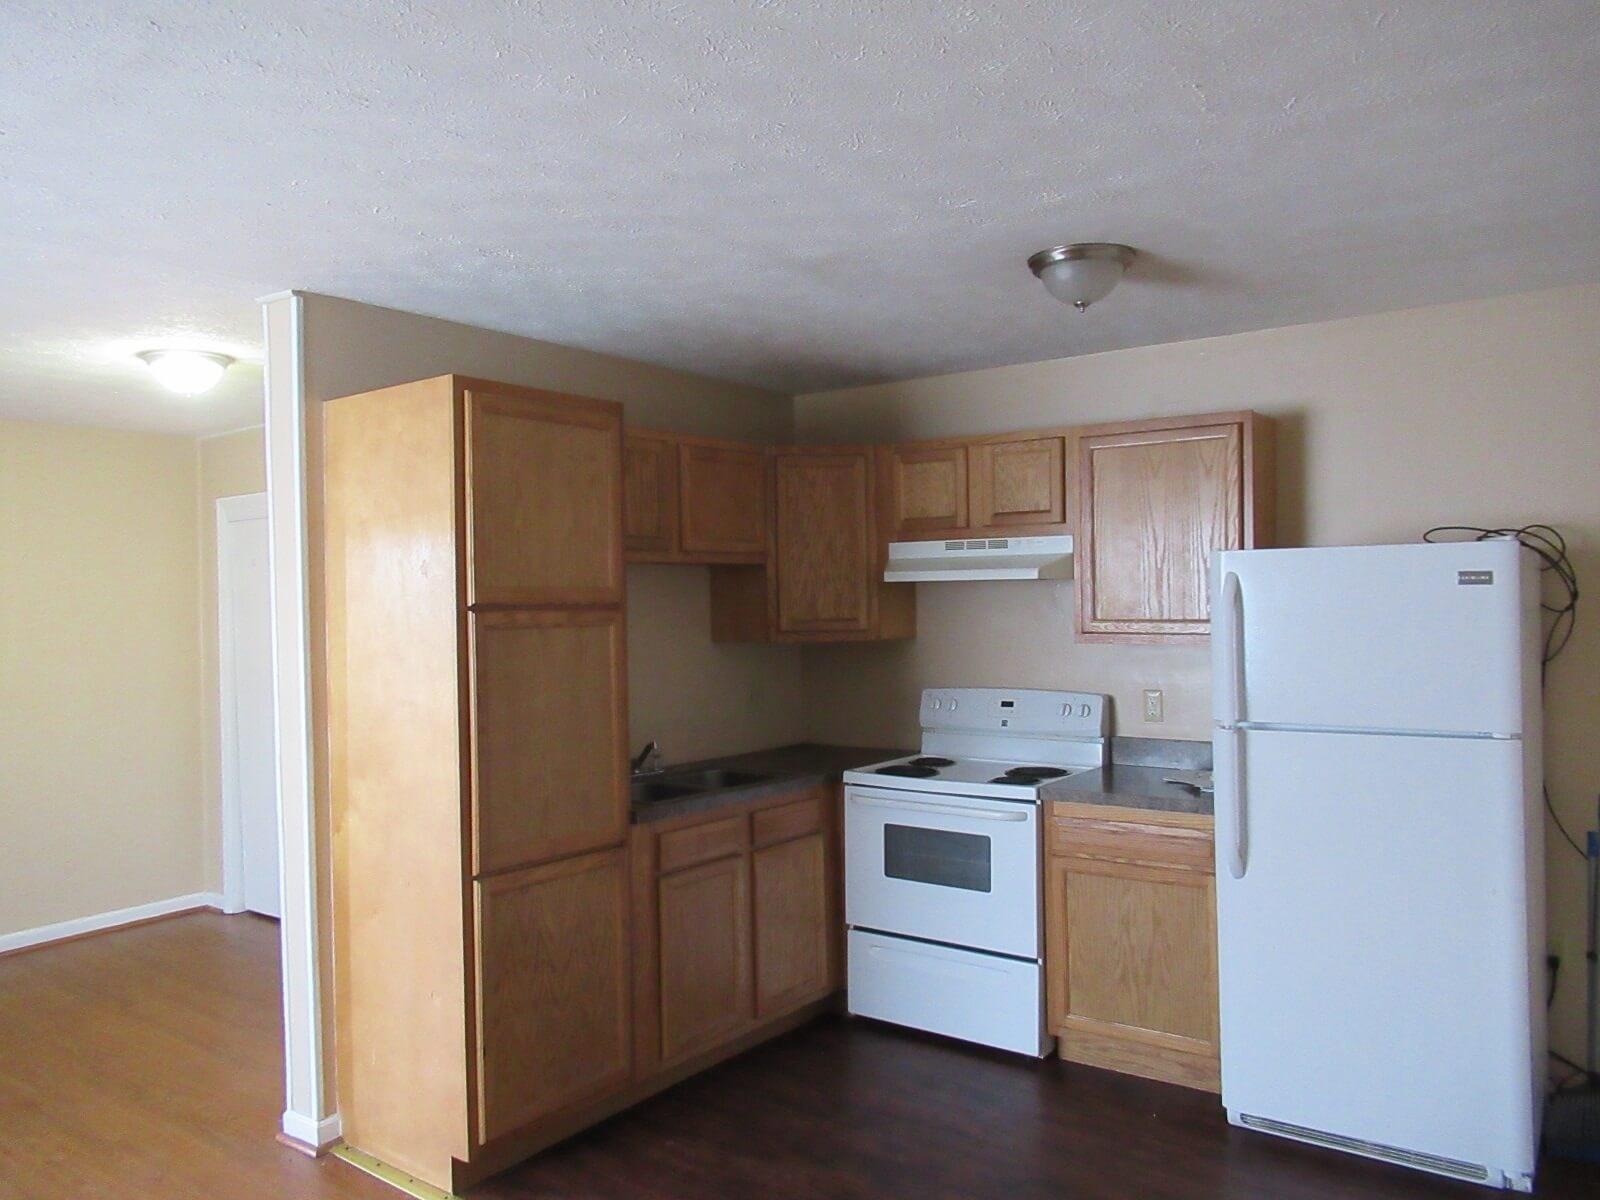 Kitchen in Morgan Apartments in Winchester, VA